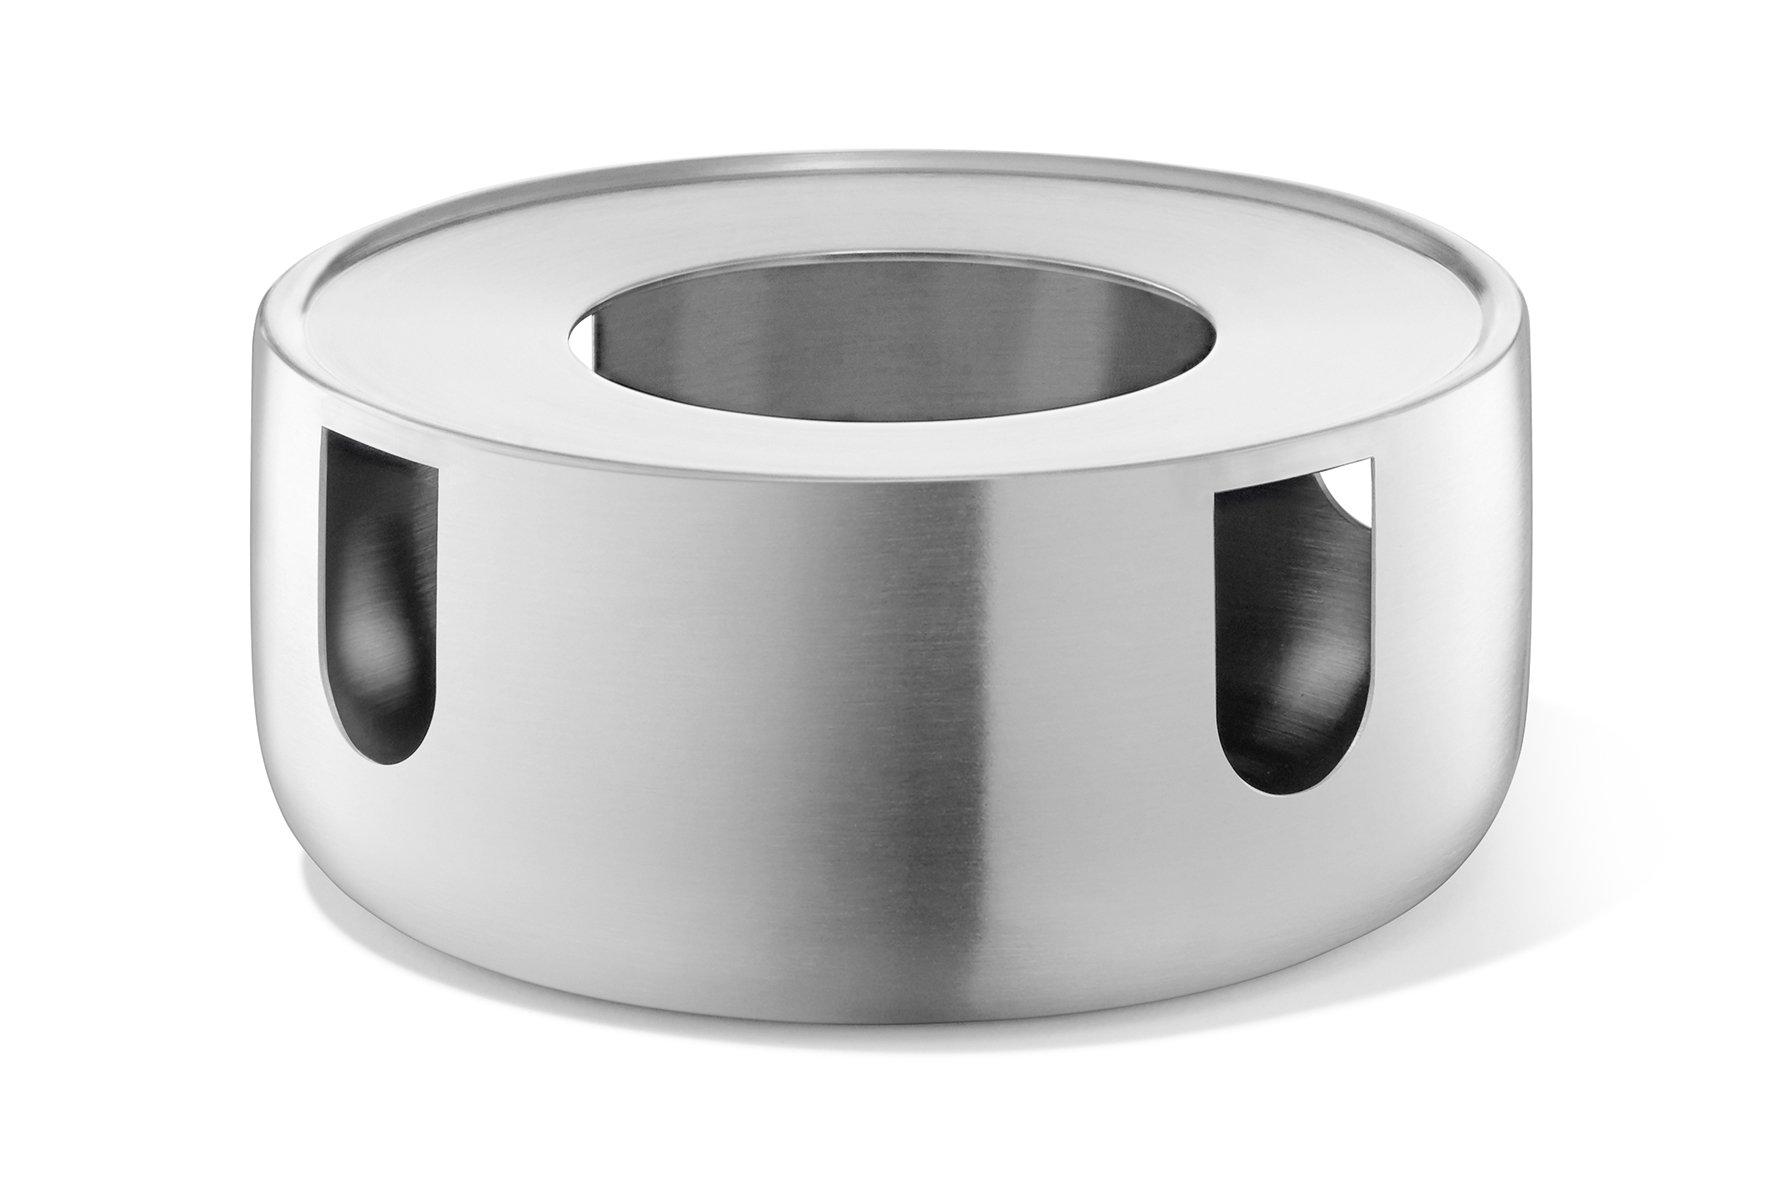 ZACK 20871 ORIGINAL''BEVO'' Tea Warmer, Stainless Steel by Zack